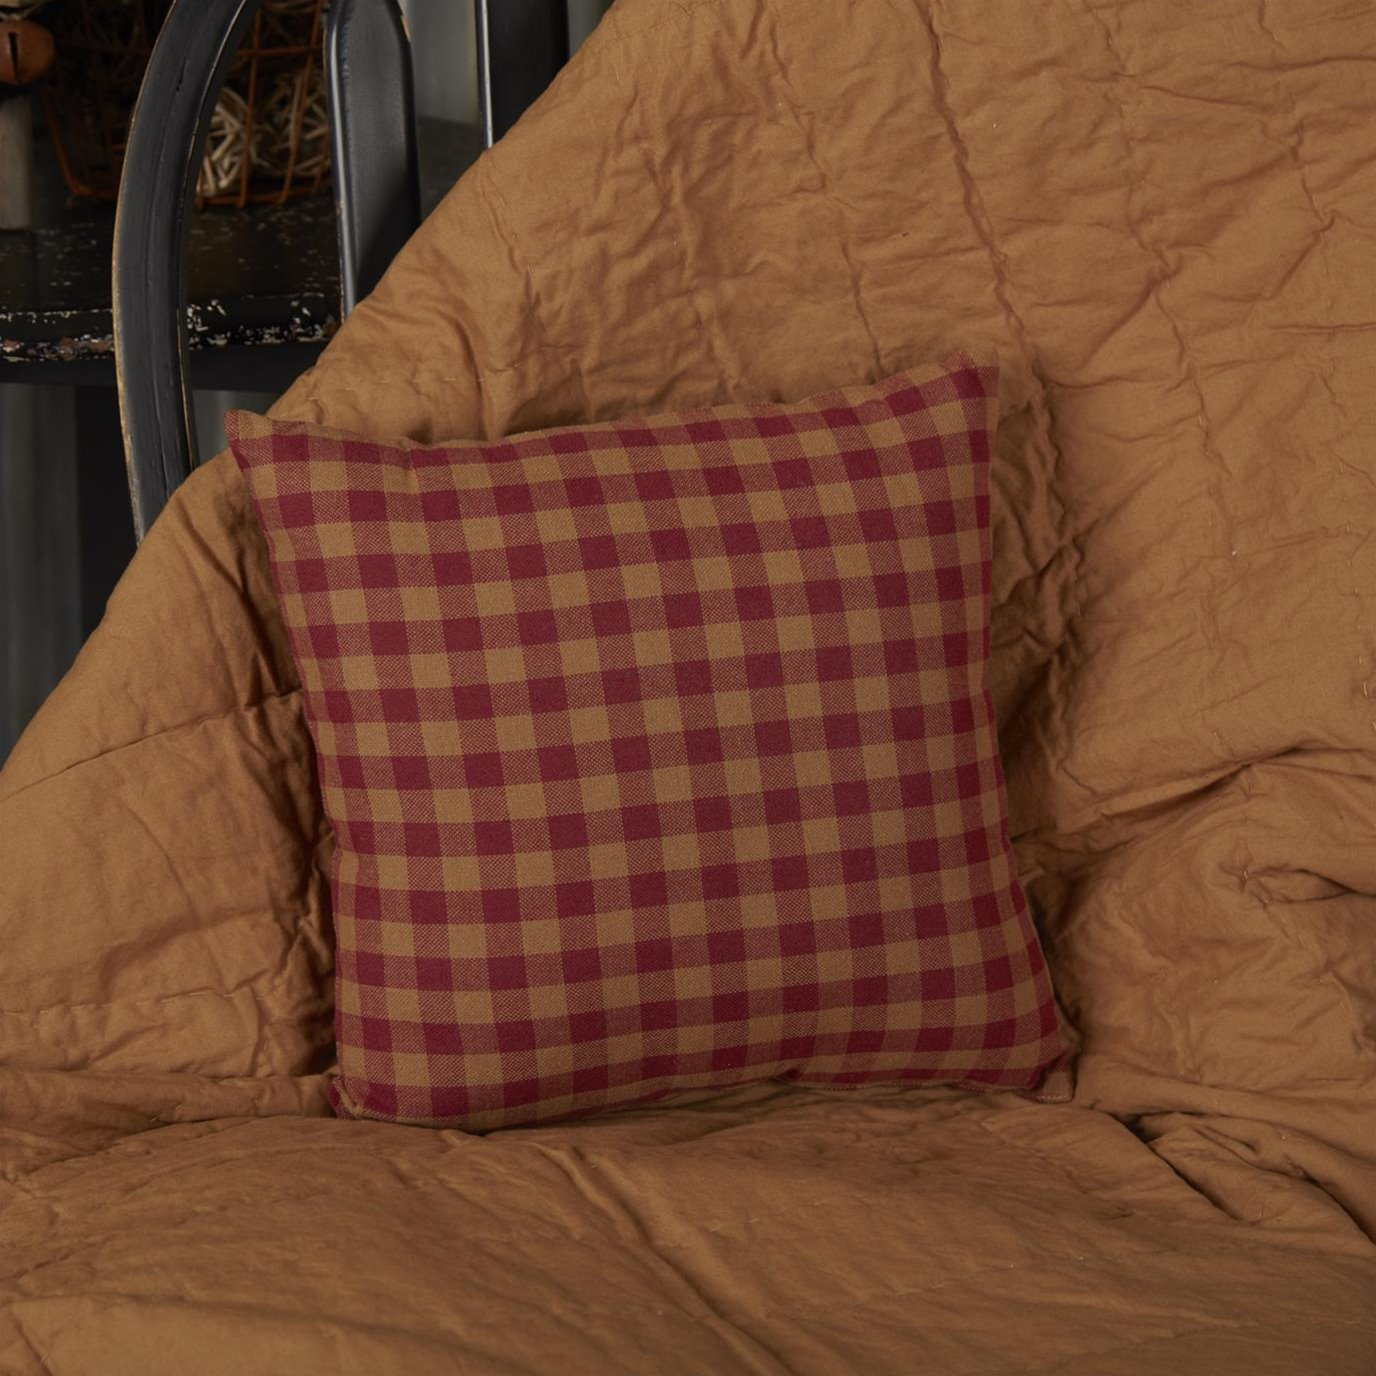 Burgundy Check Fabric Pillow 12x12